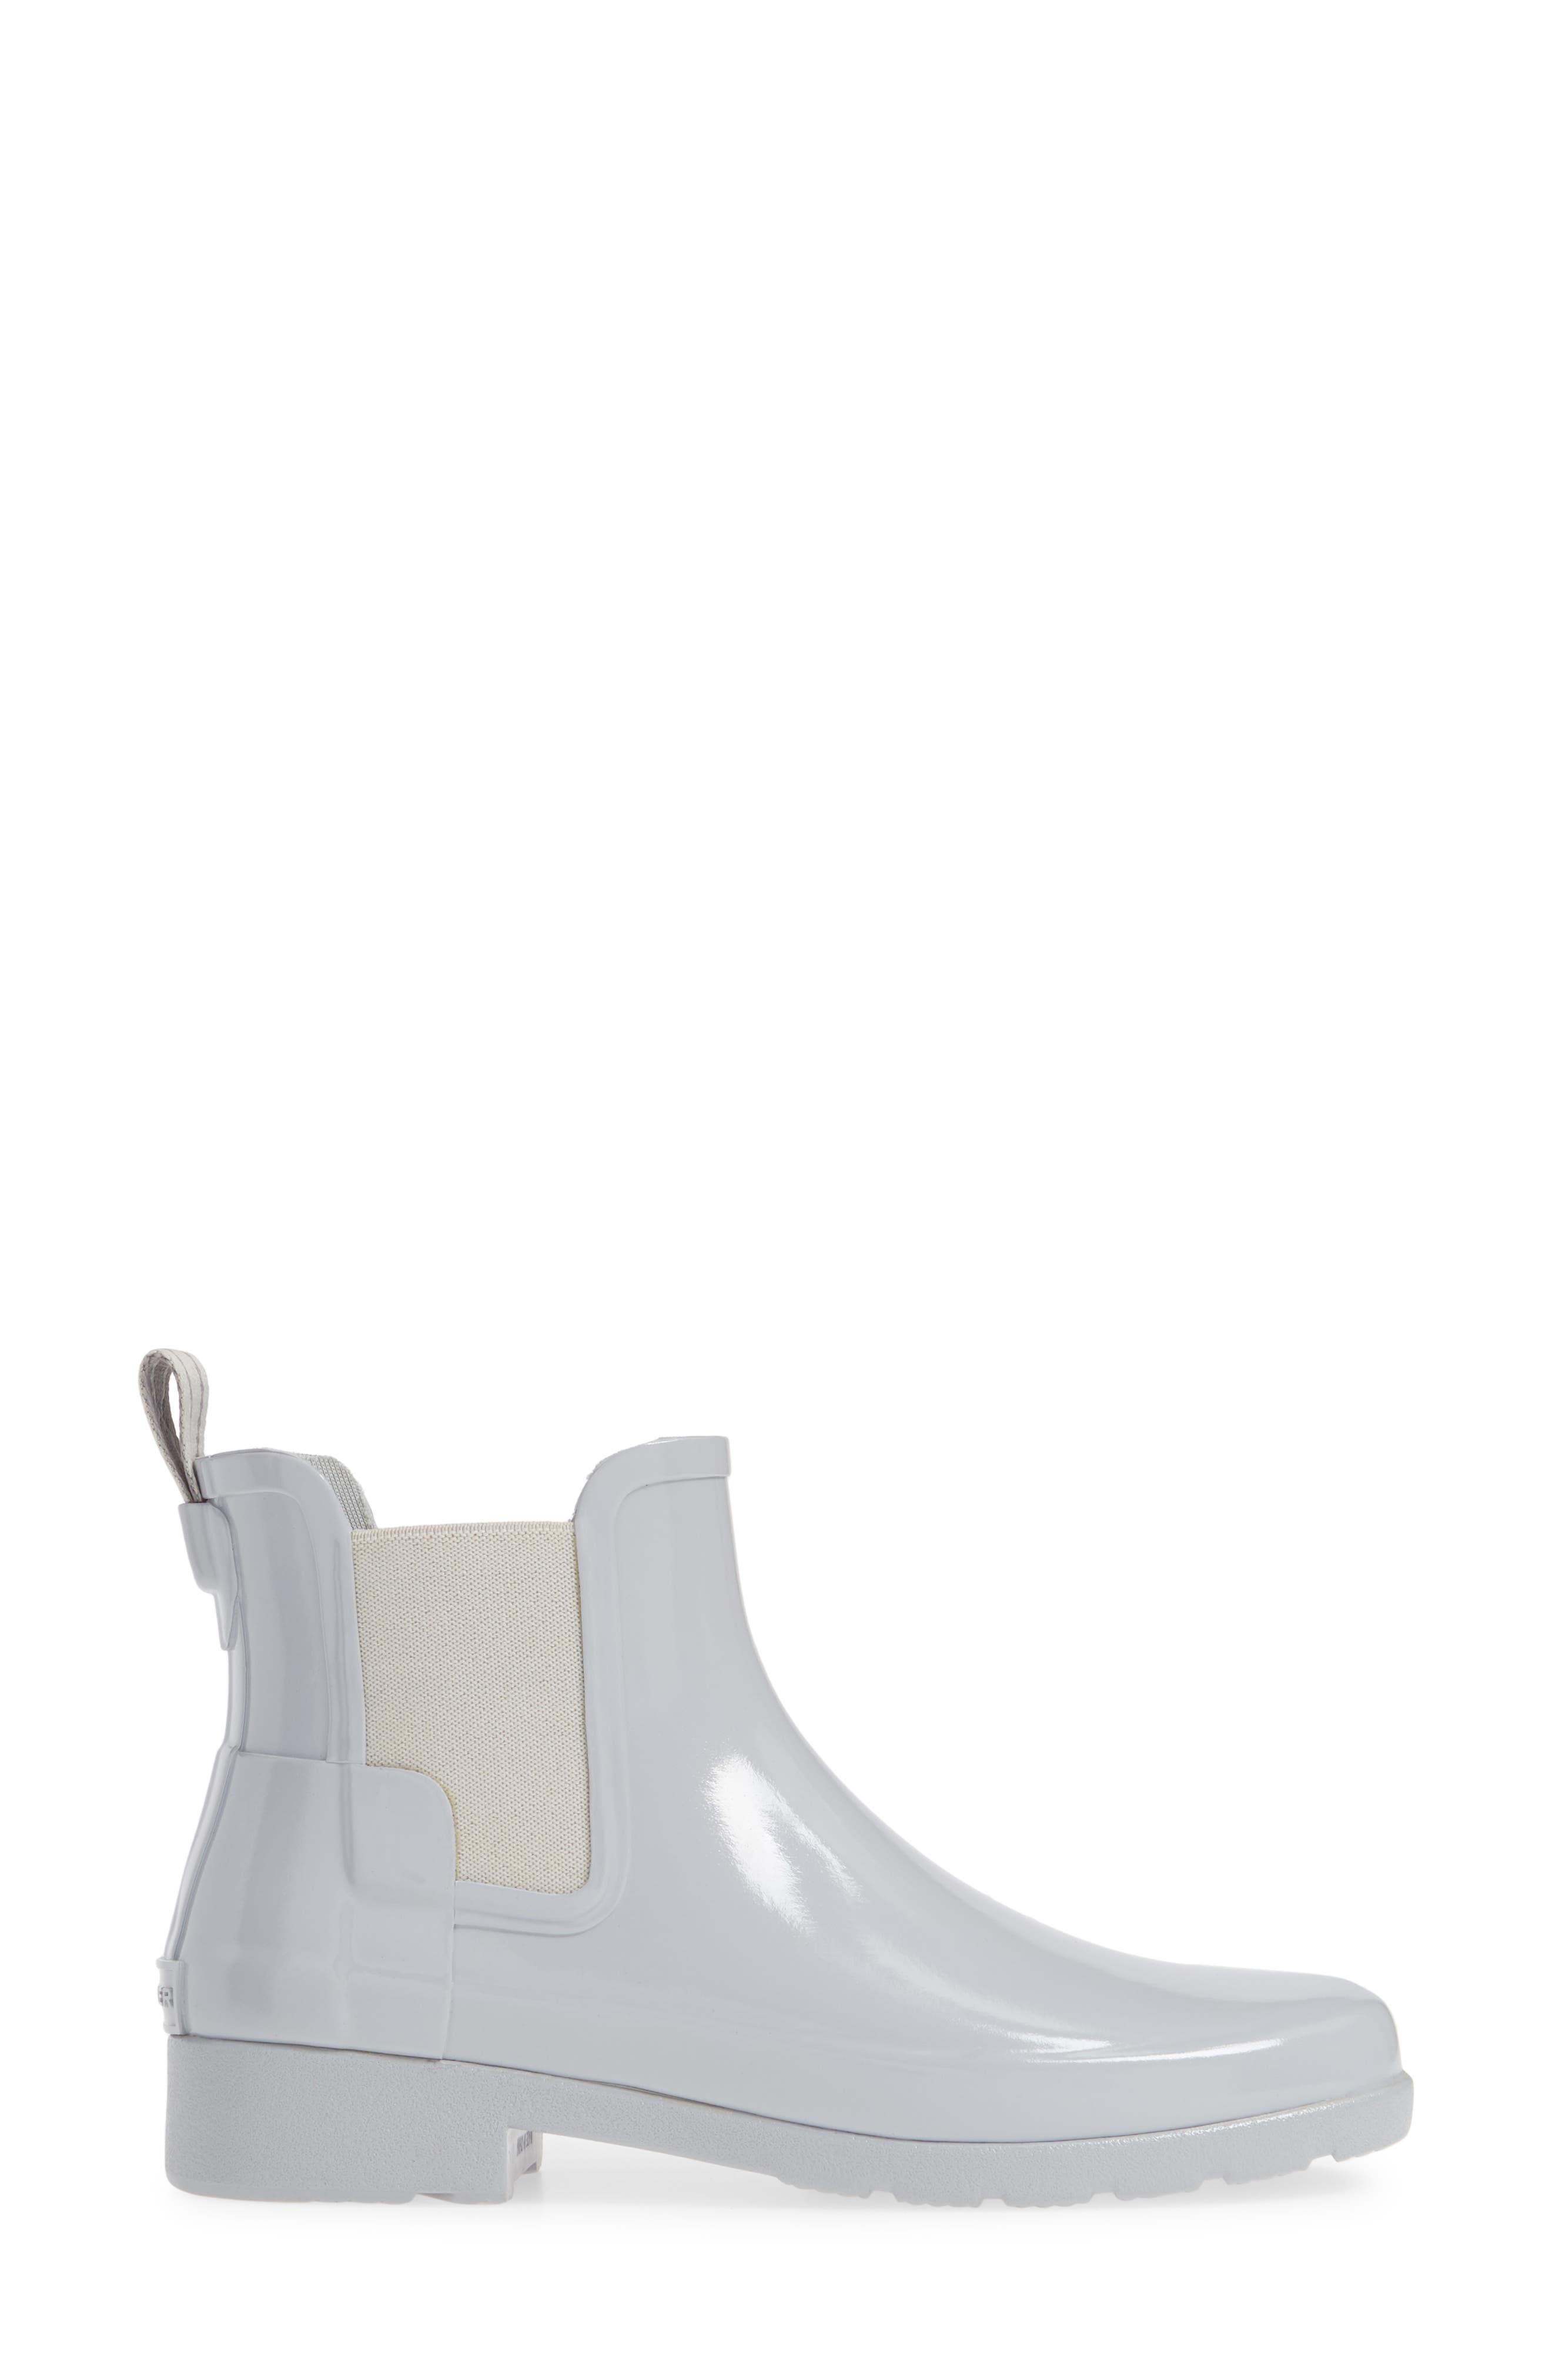 HUNTER, Original Refined Chelsea Waterproof Rain Boot, Alternate thumbnail 3, color, 074